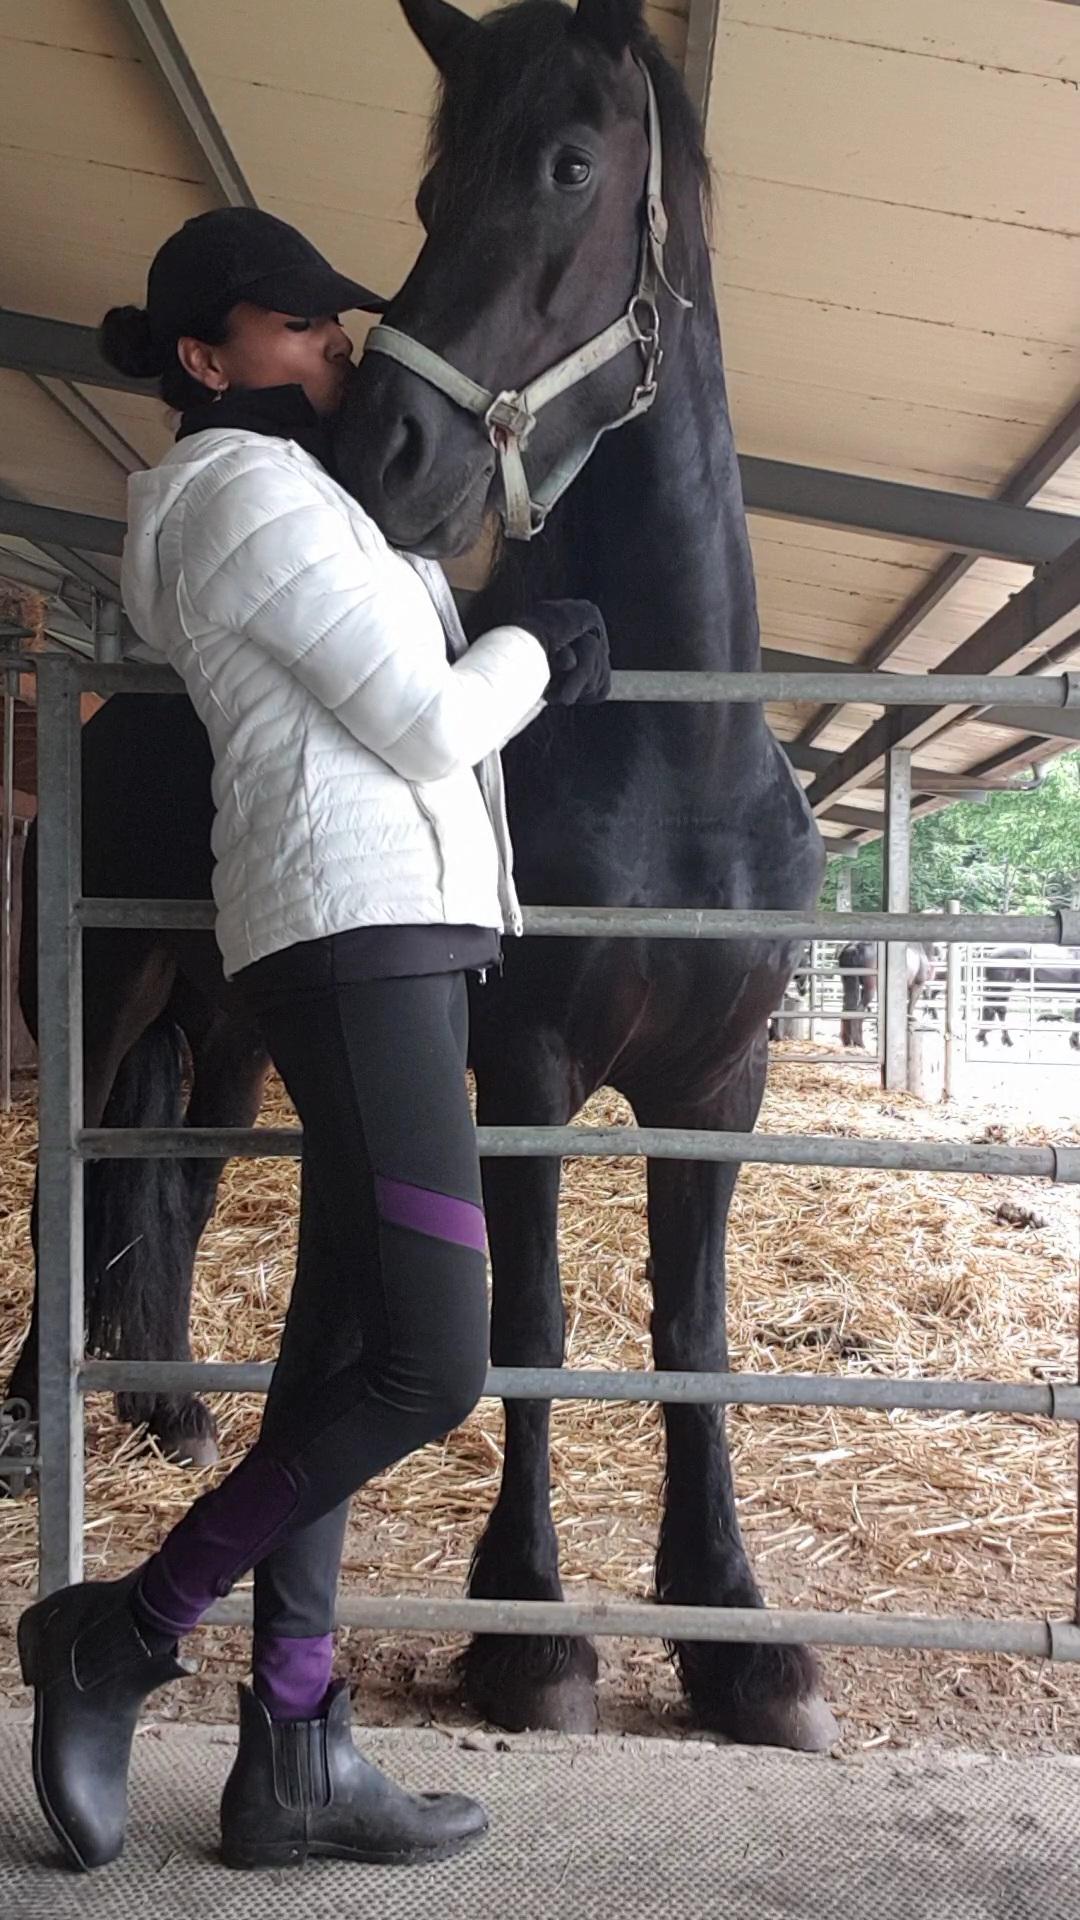 Young non-ridden Friesian Horse